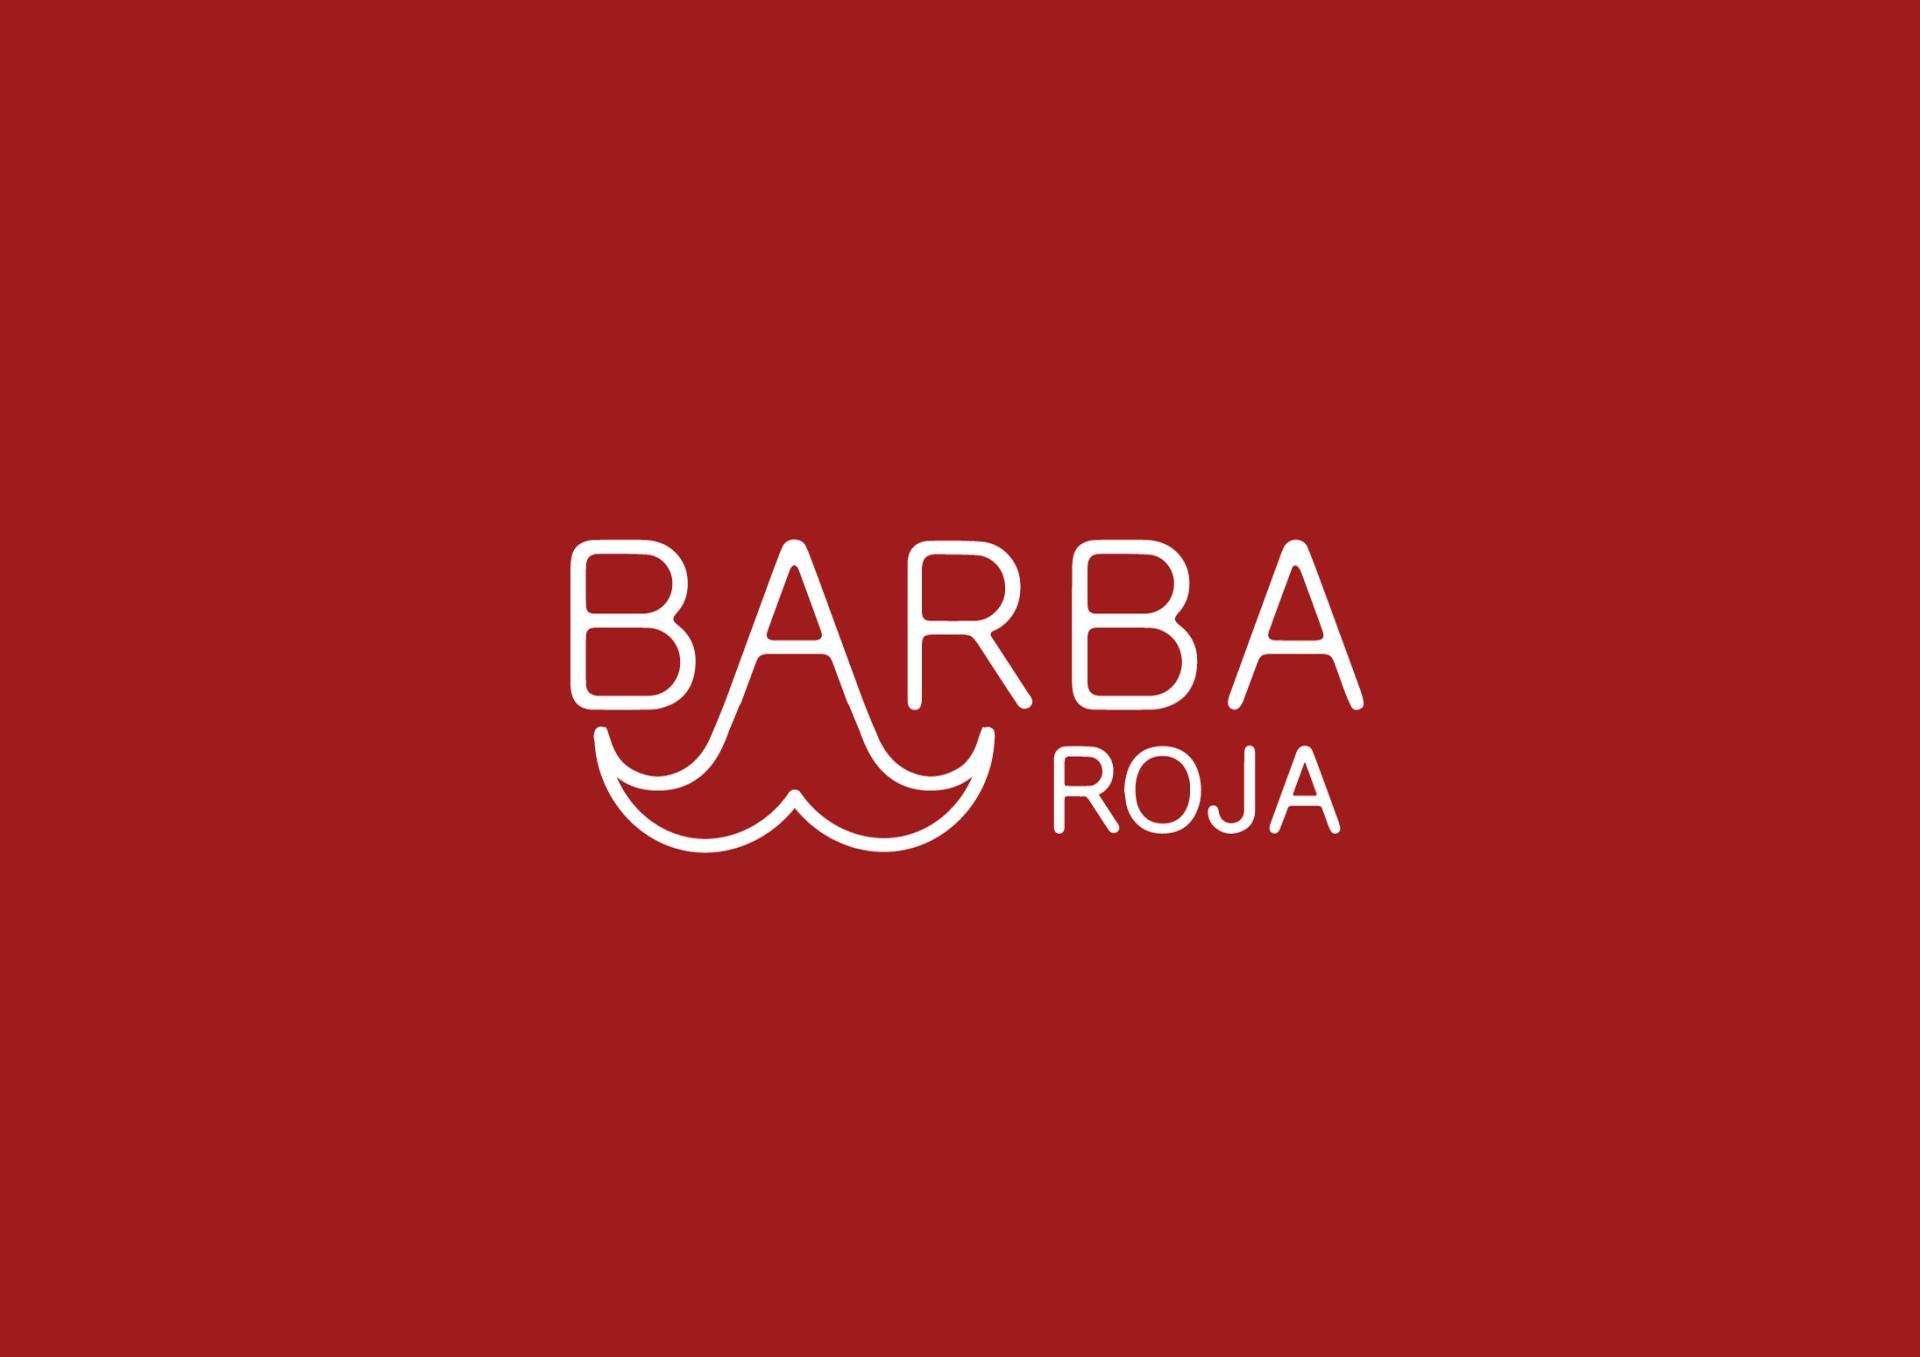 barbaroja4